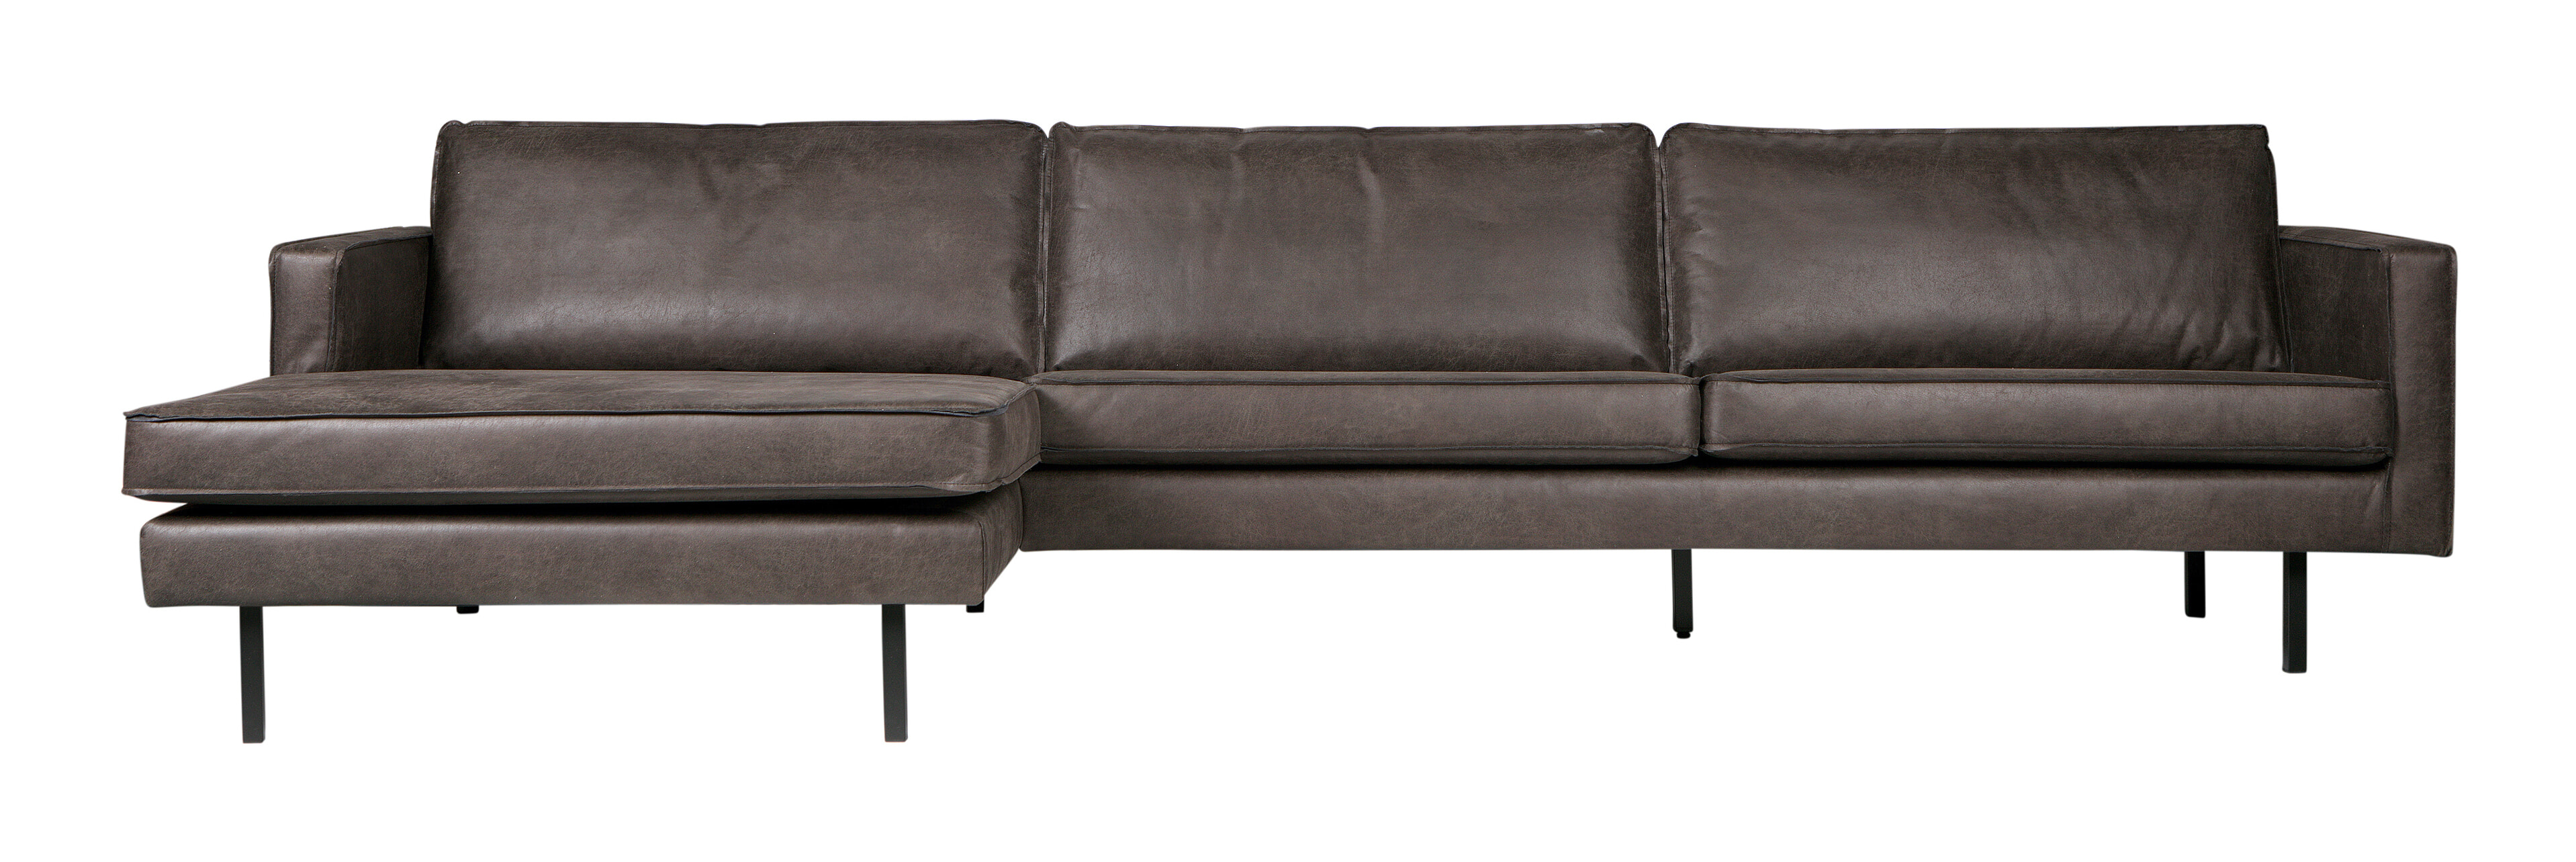 BePureHome Loungebank 'Rodeo' Links, Eco Leder, kleur Zwart Eco Leder: 70% leder en 30% polyester aanschaffen? Kijk hier!